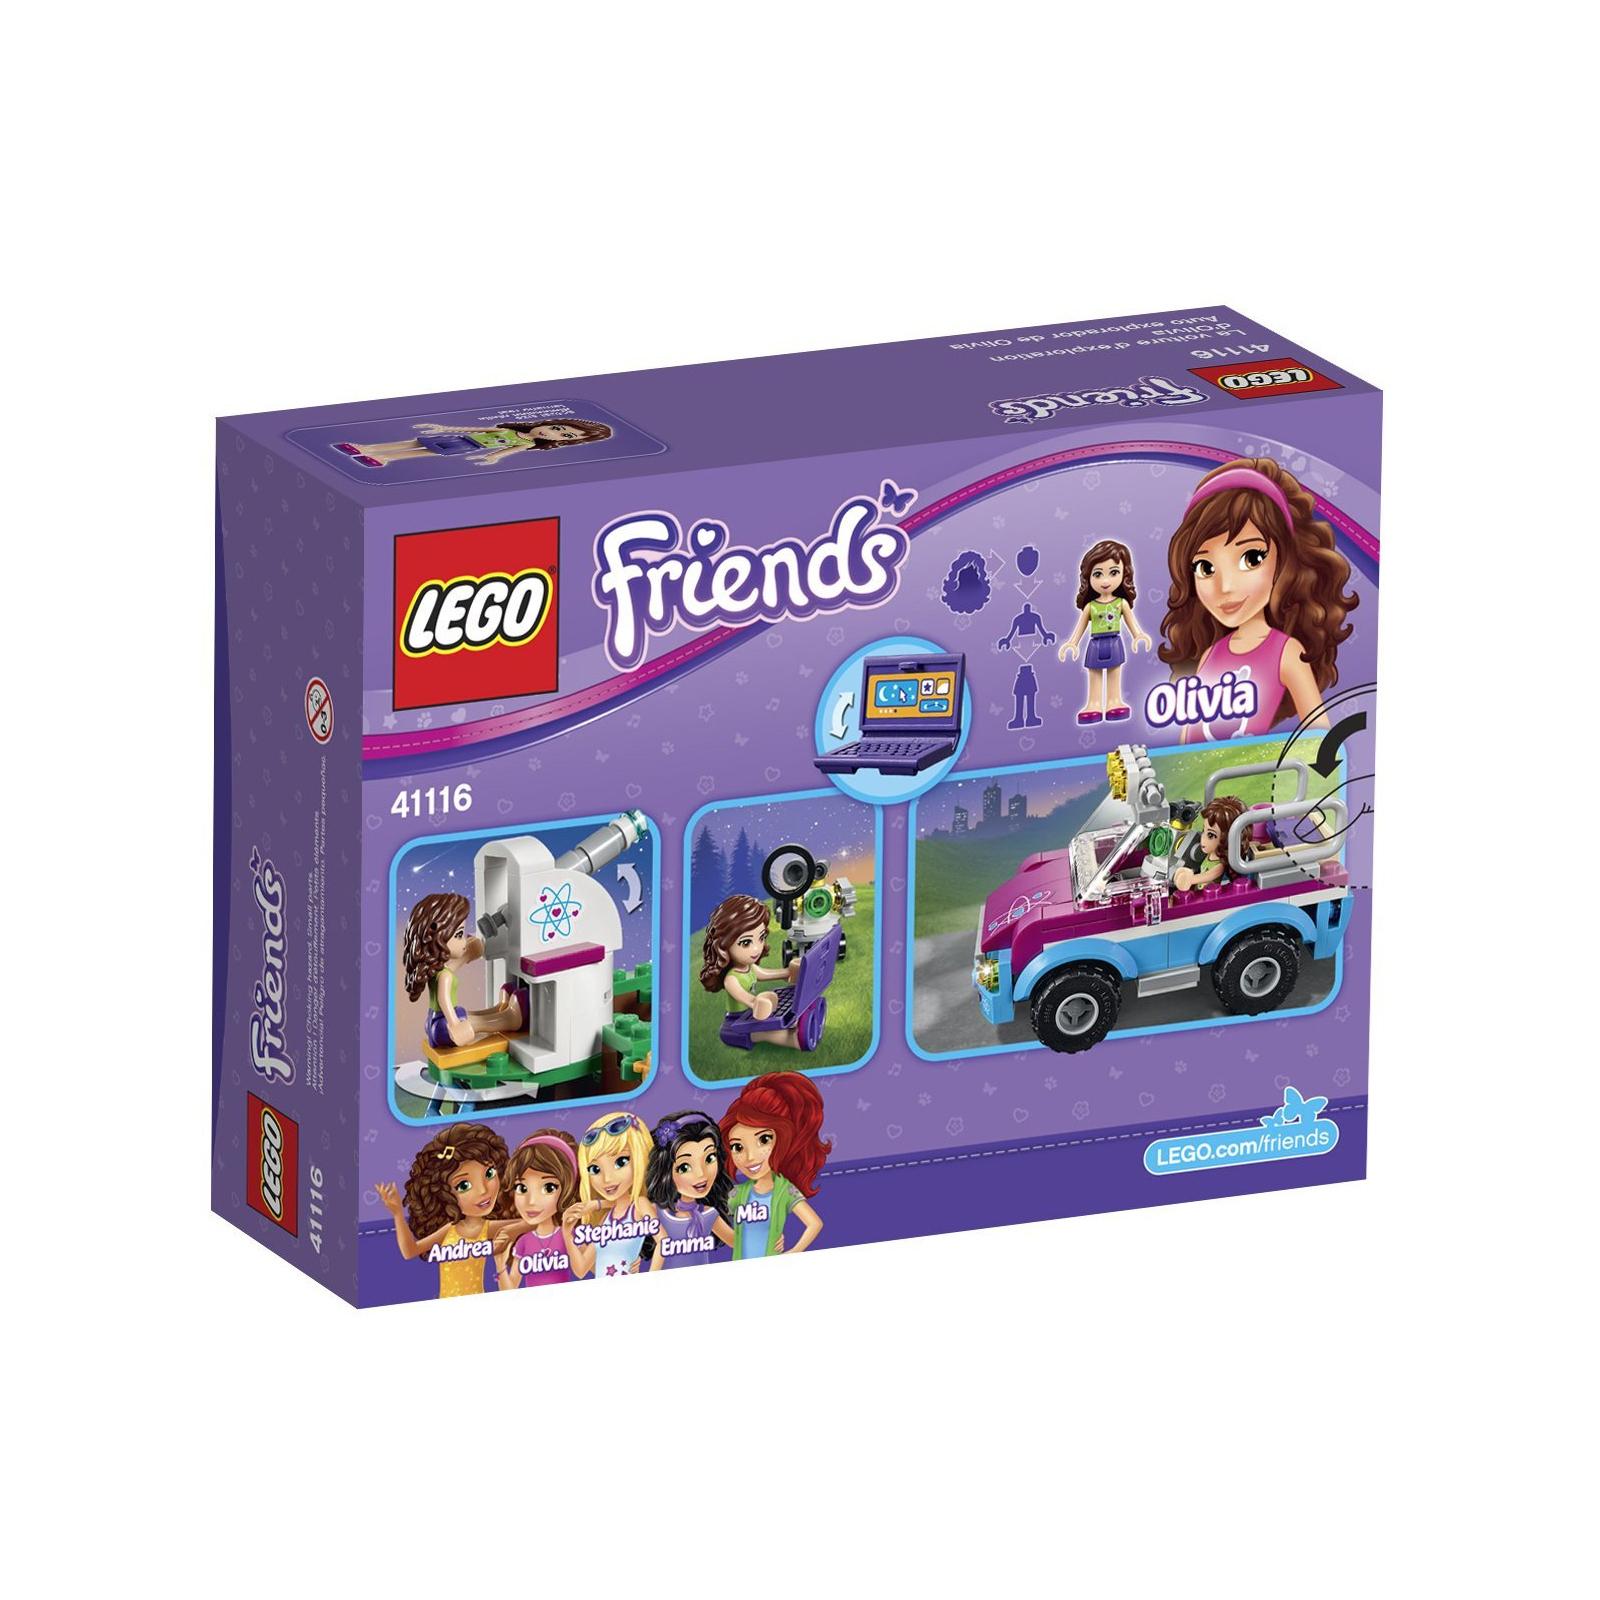 Конструктор LEGO Friends Звездное небо Оливии (41116) изображение 12